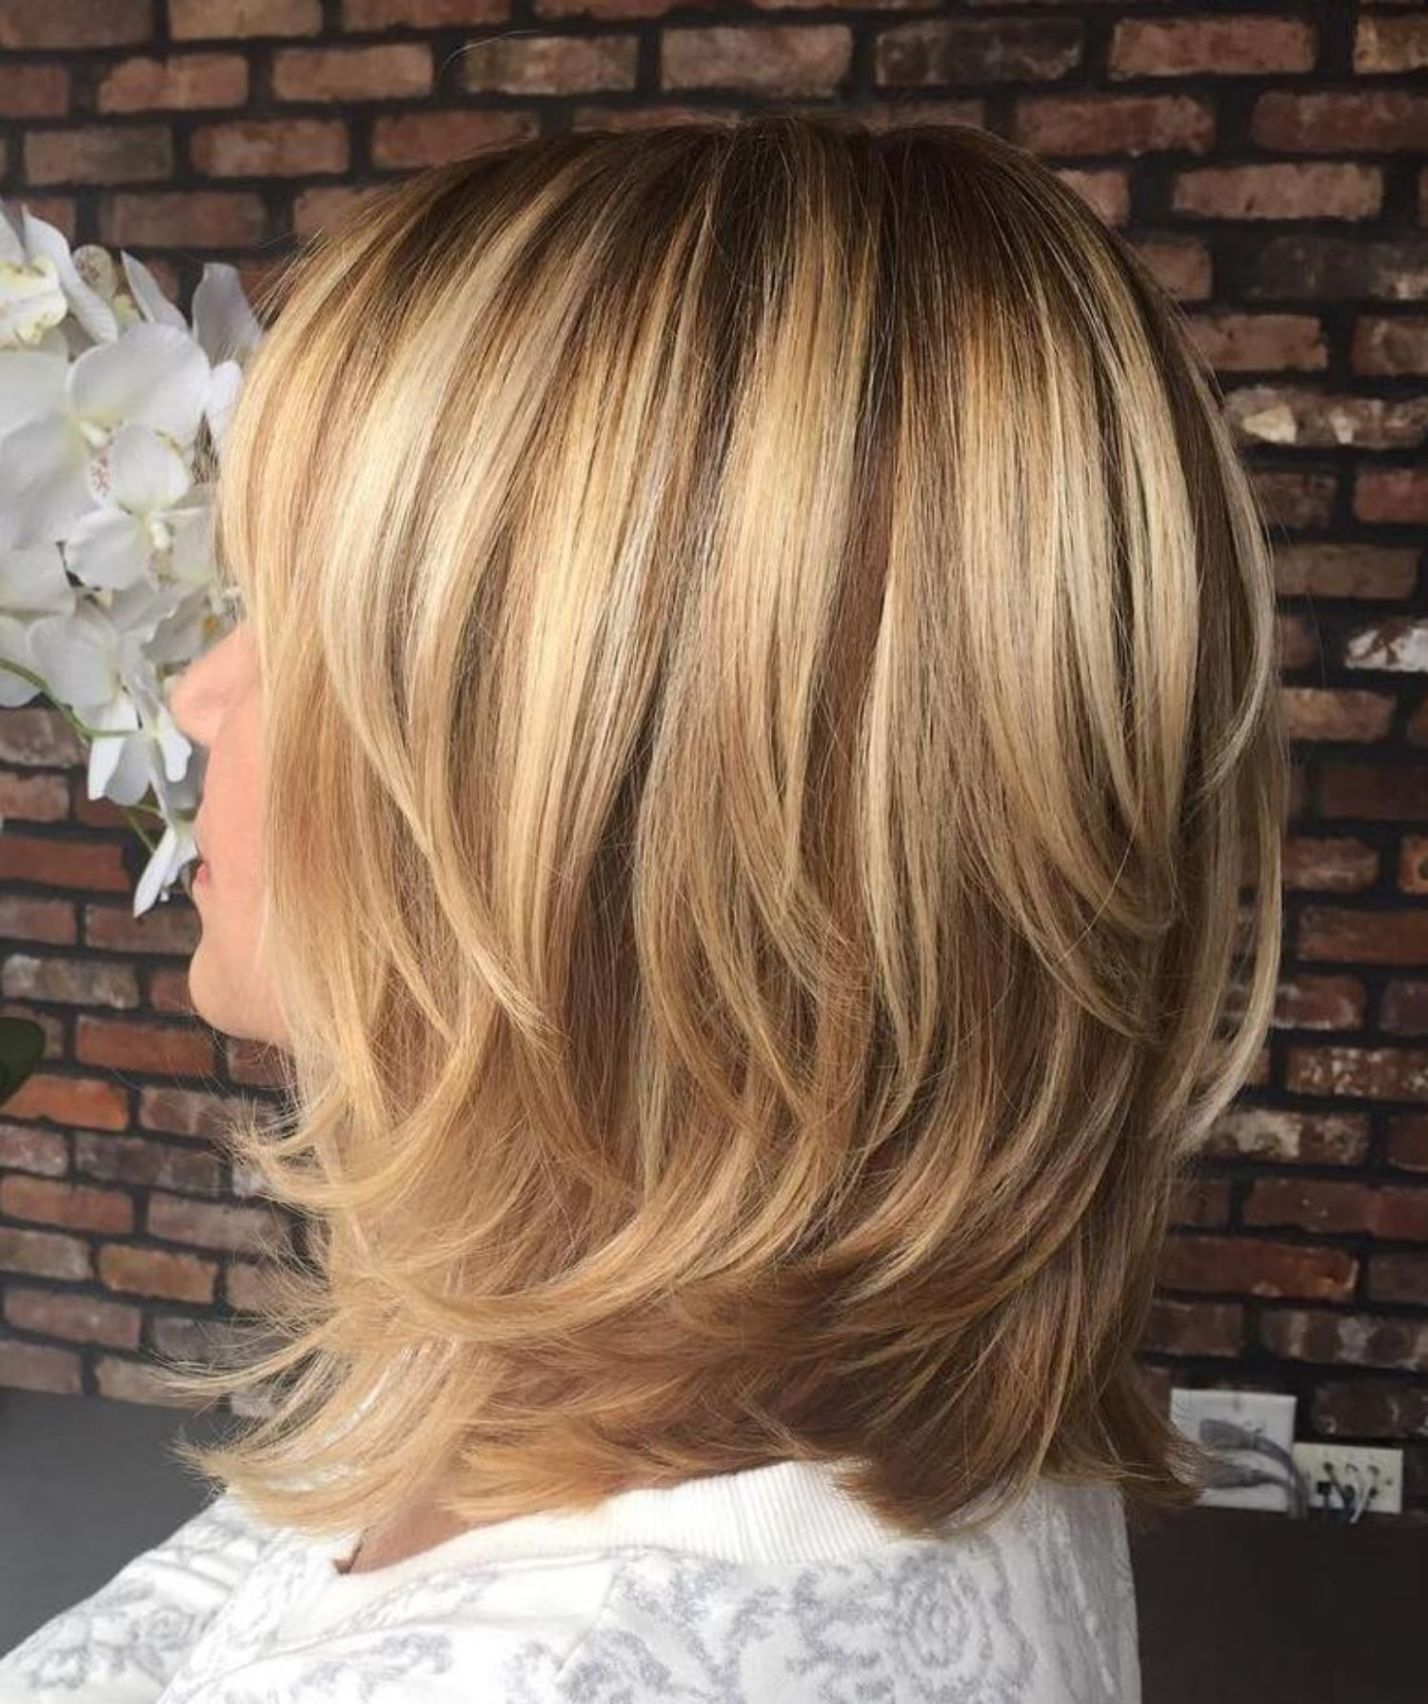 60 Fun And Flattering Medium Hairstyles For Women Hair Hair